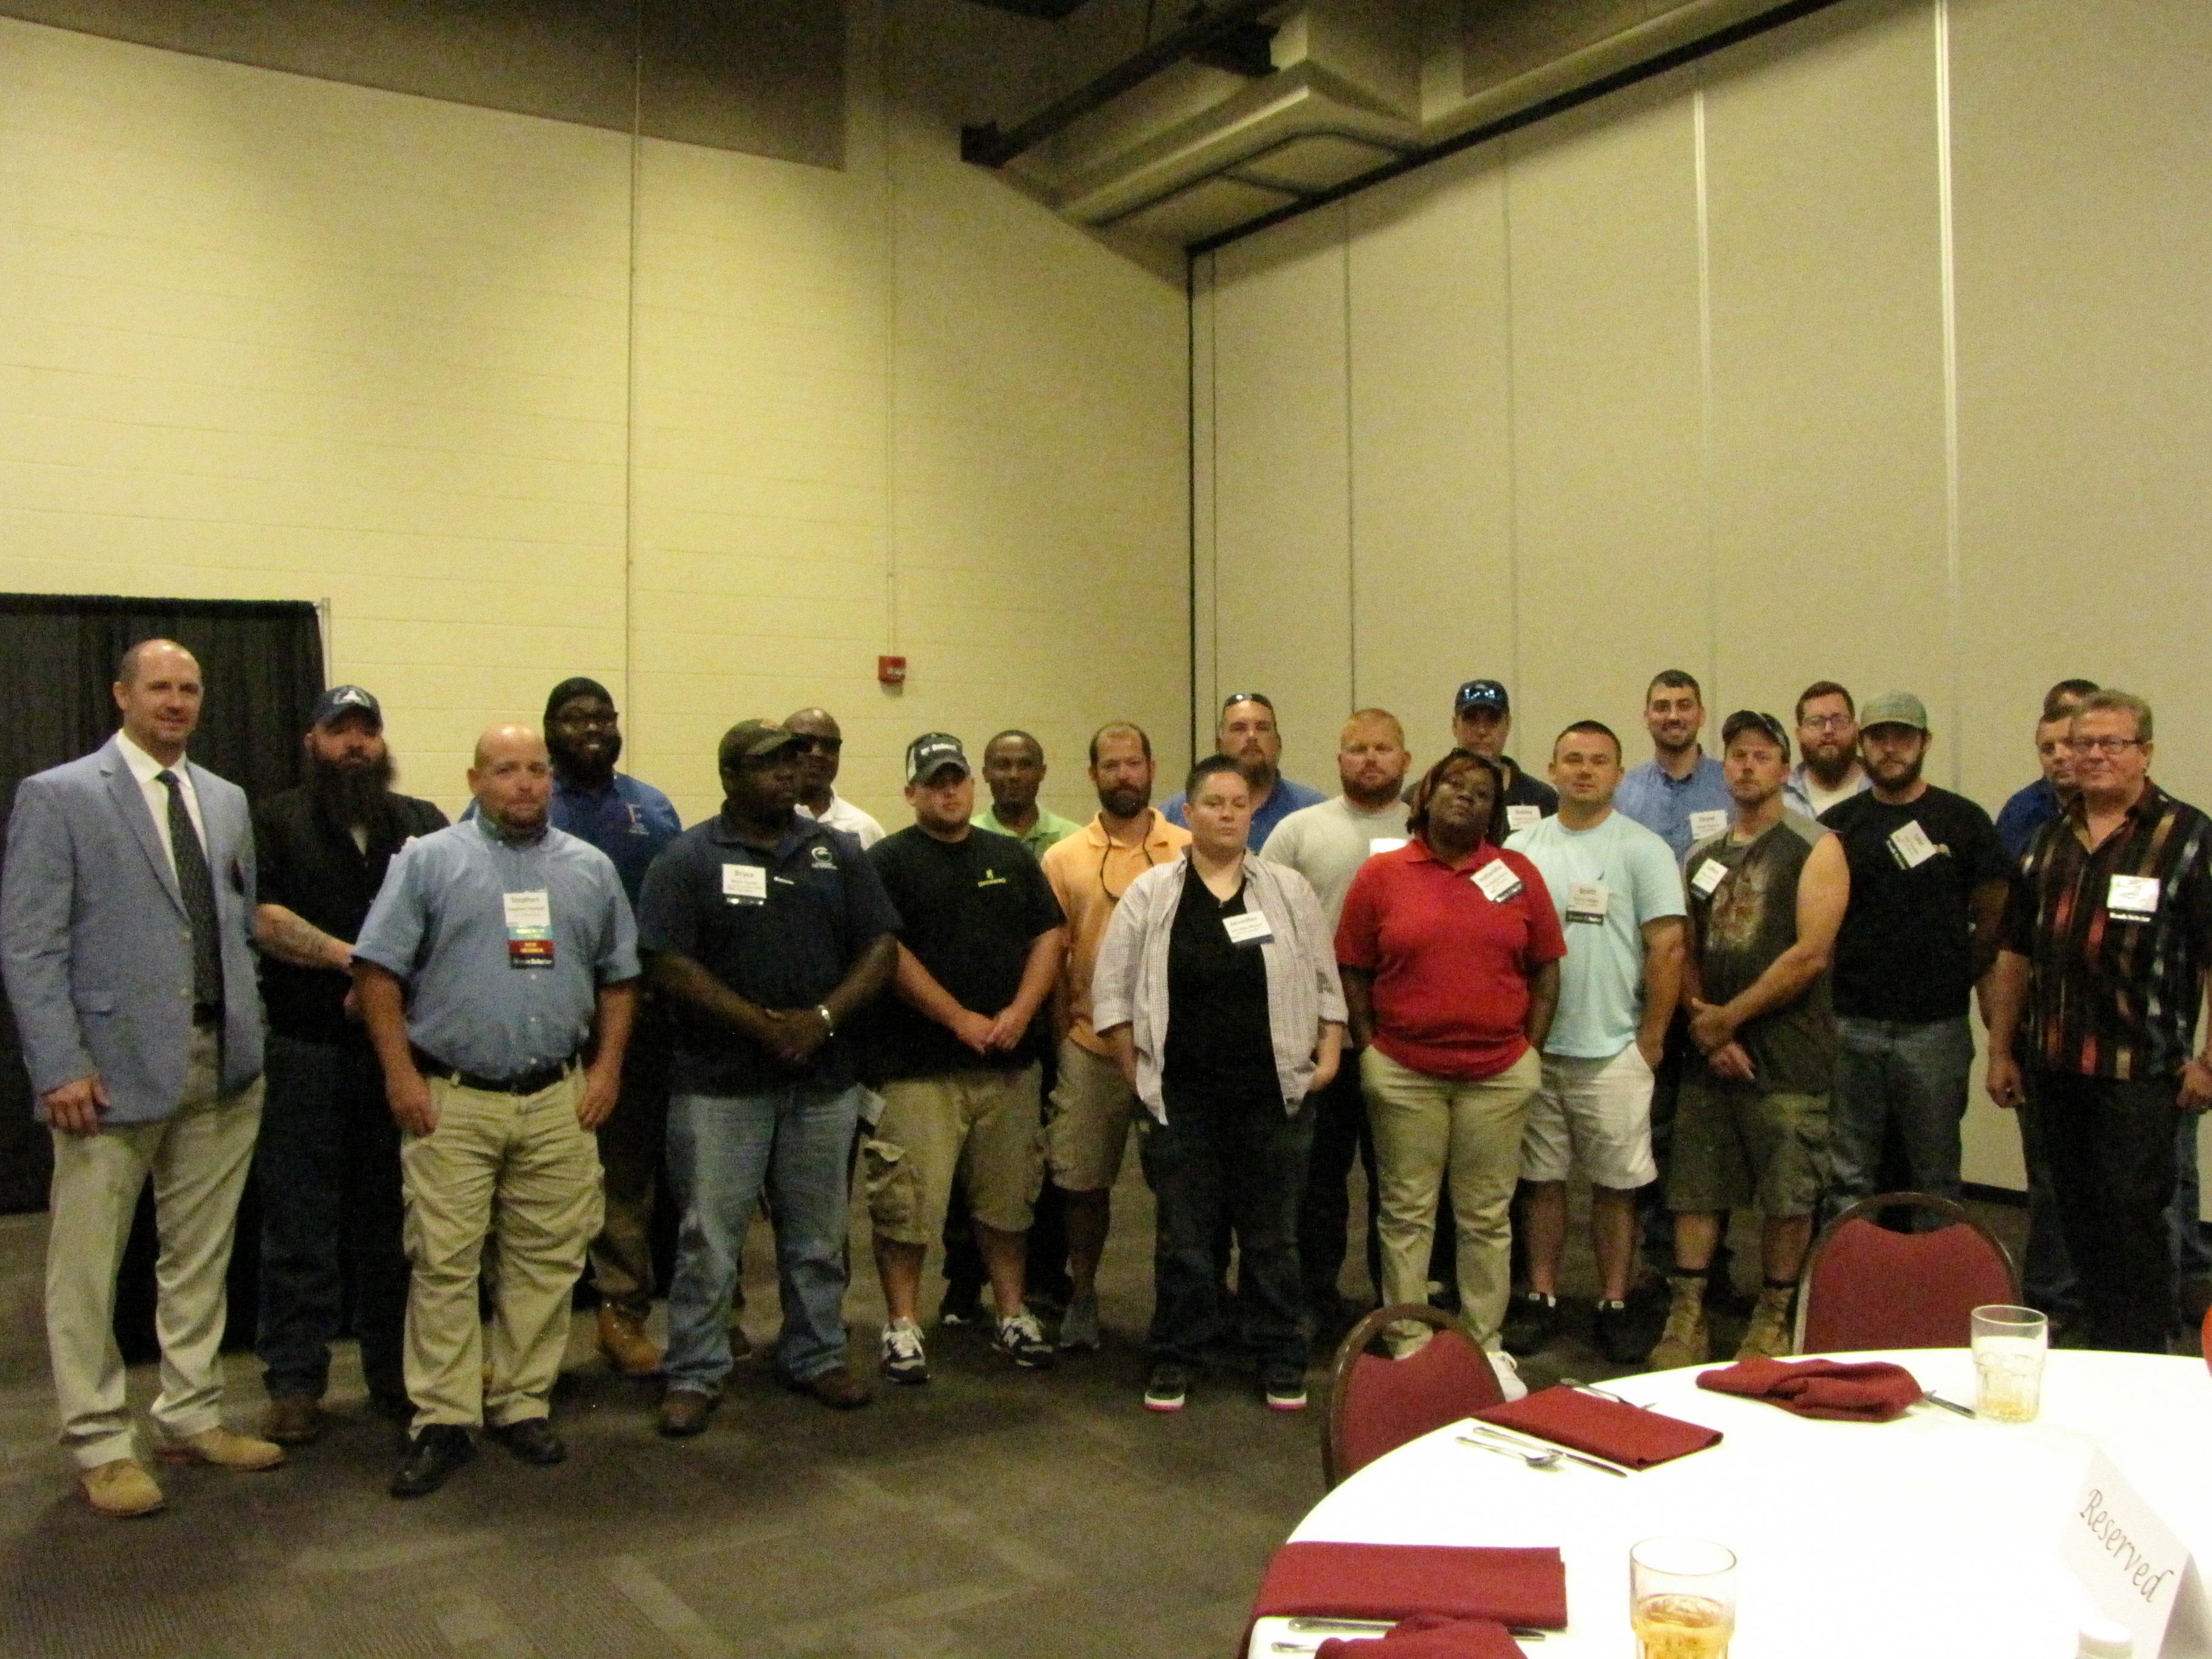 2017 roads scholar graduates group photo